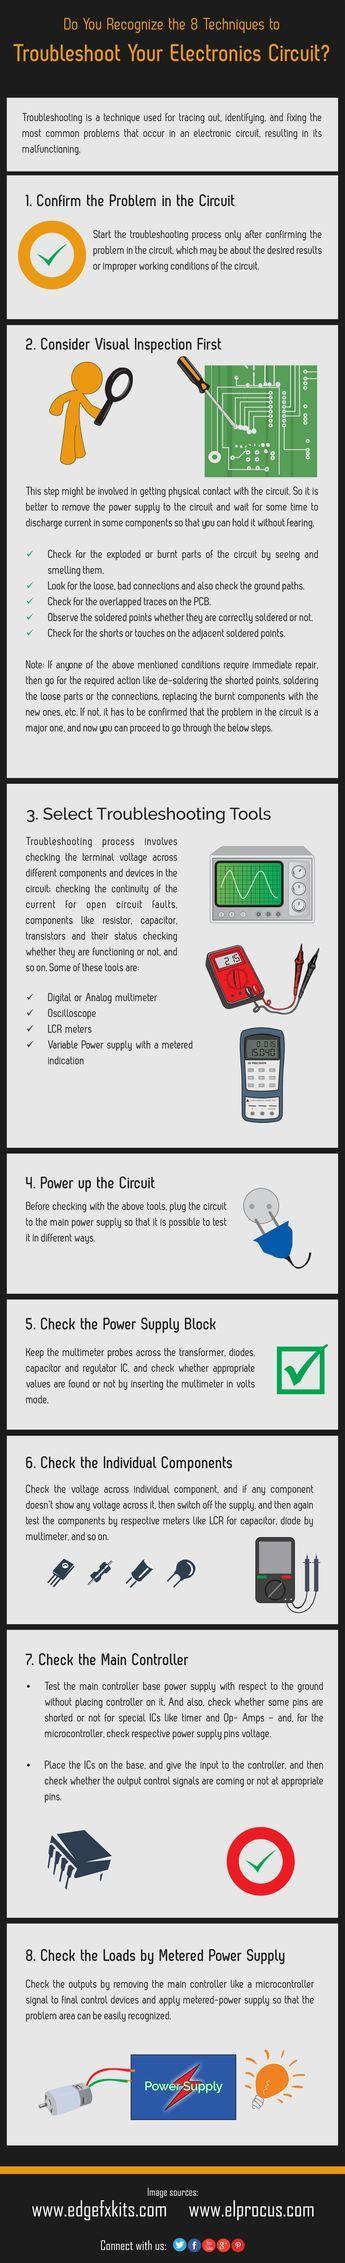 Troubleshoot The Electronic Circuit